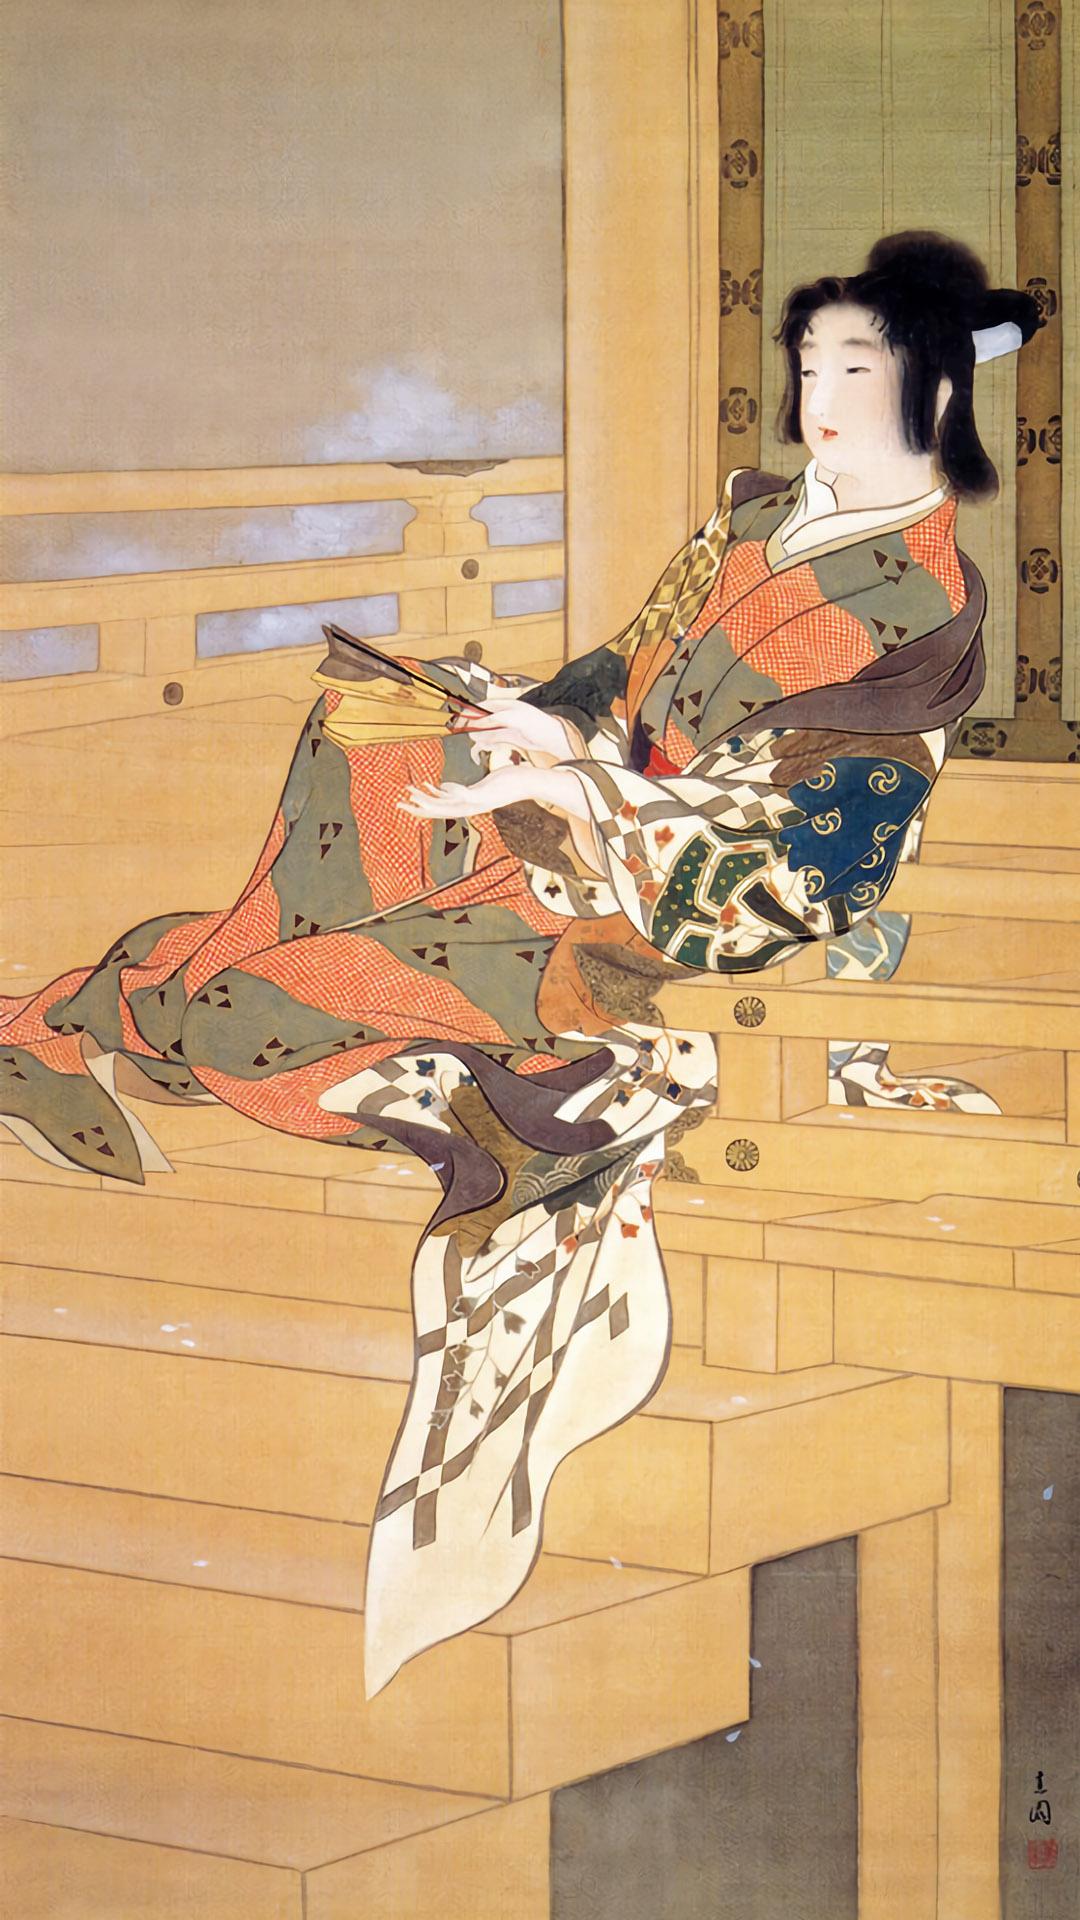 Ikeda Shoen - Utage no itoma 1080x1920